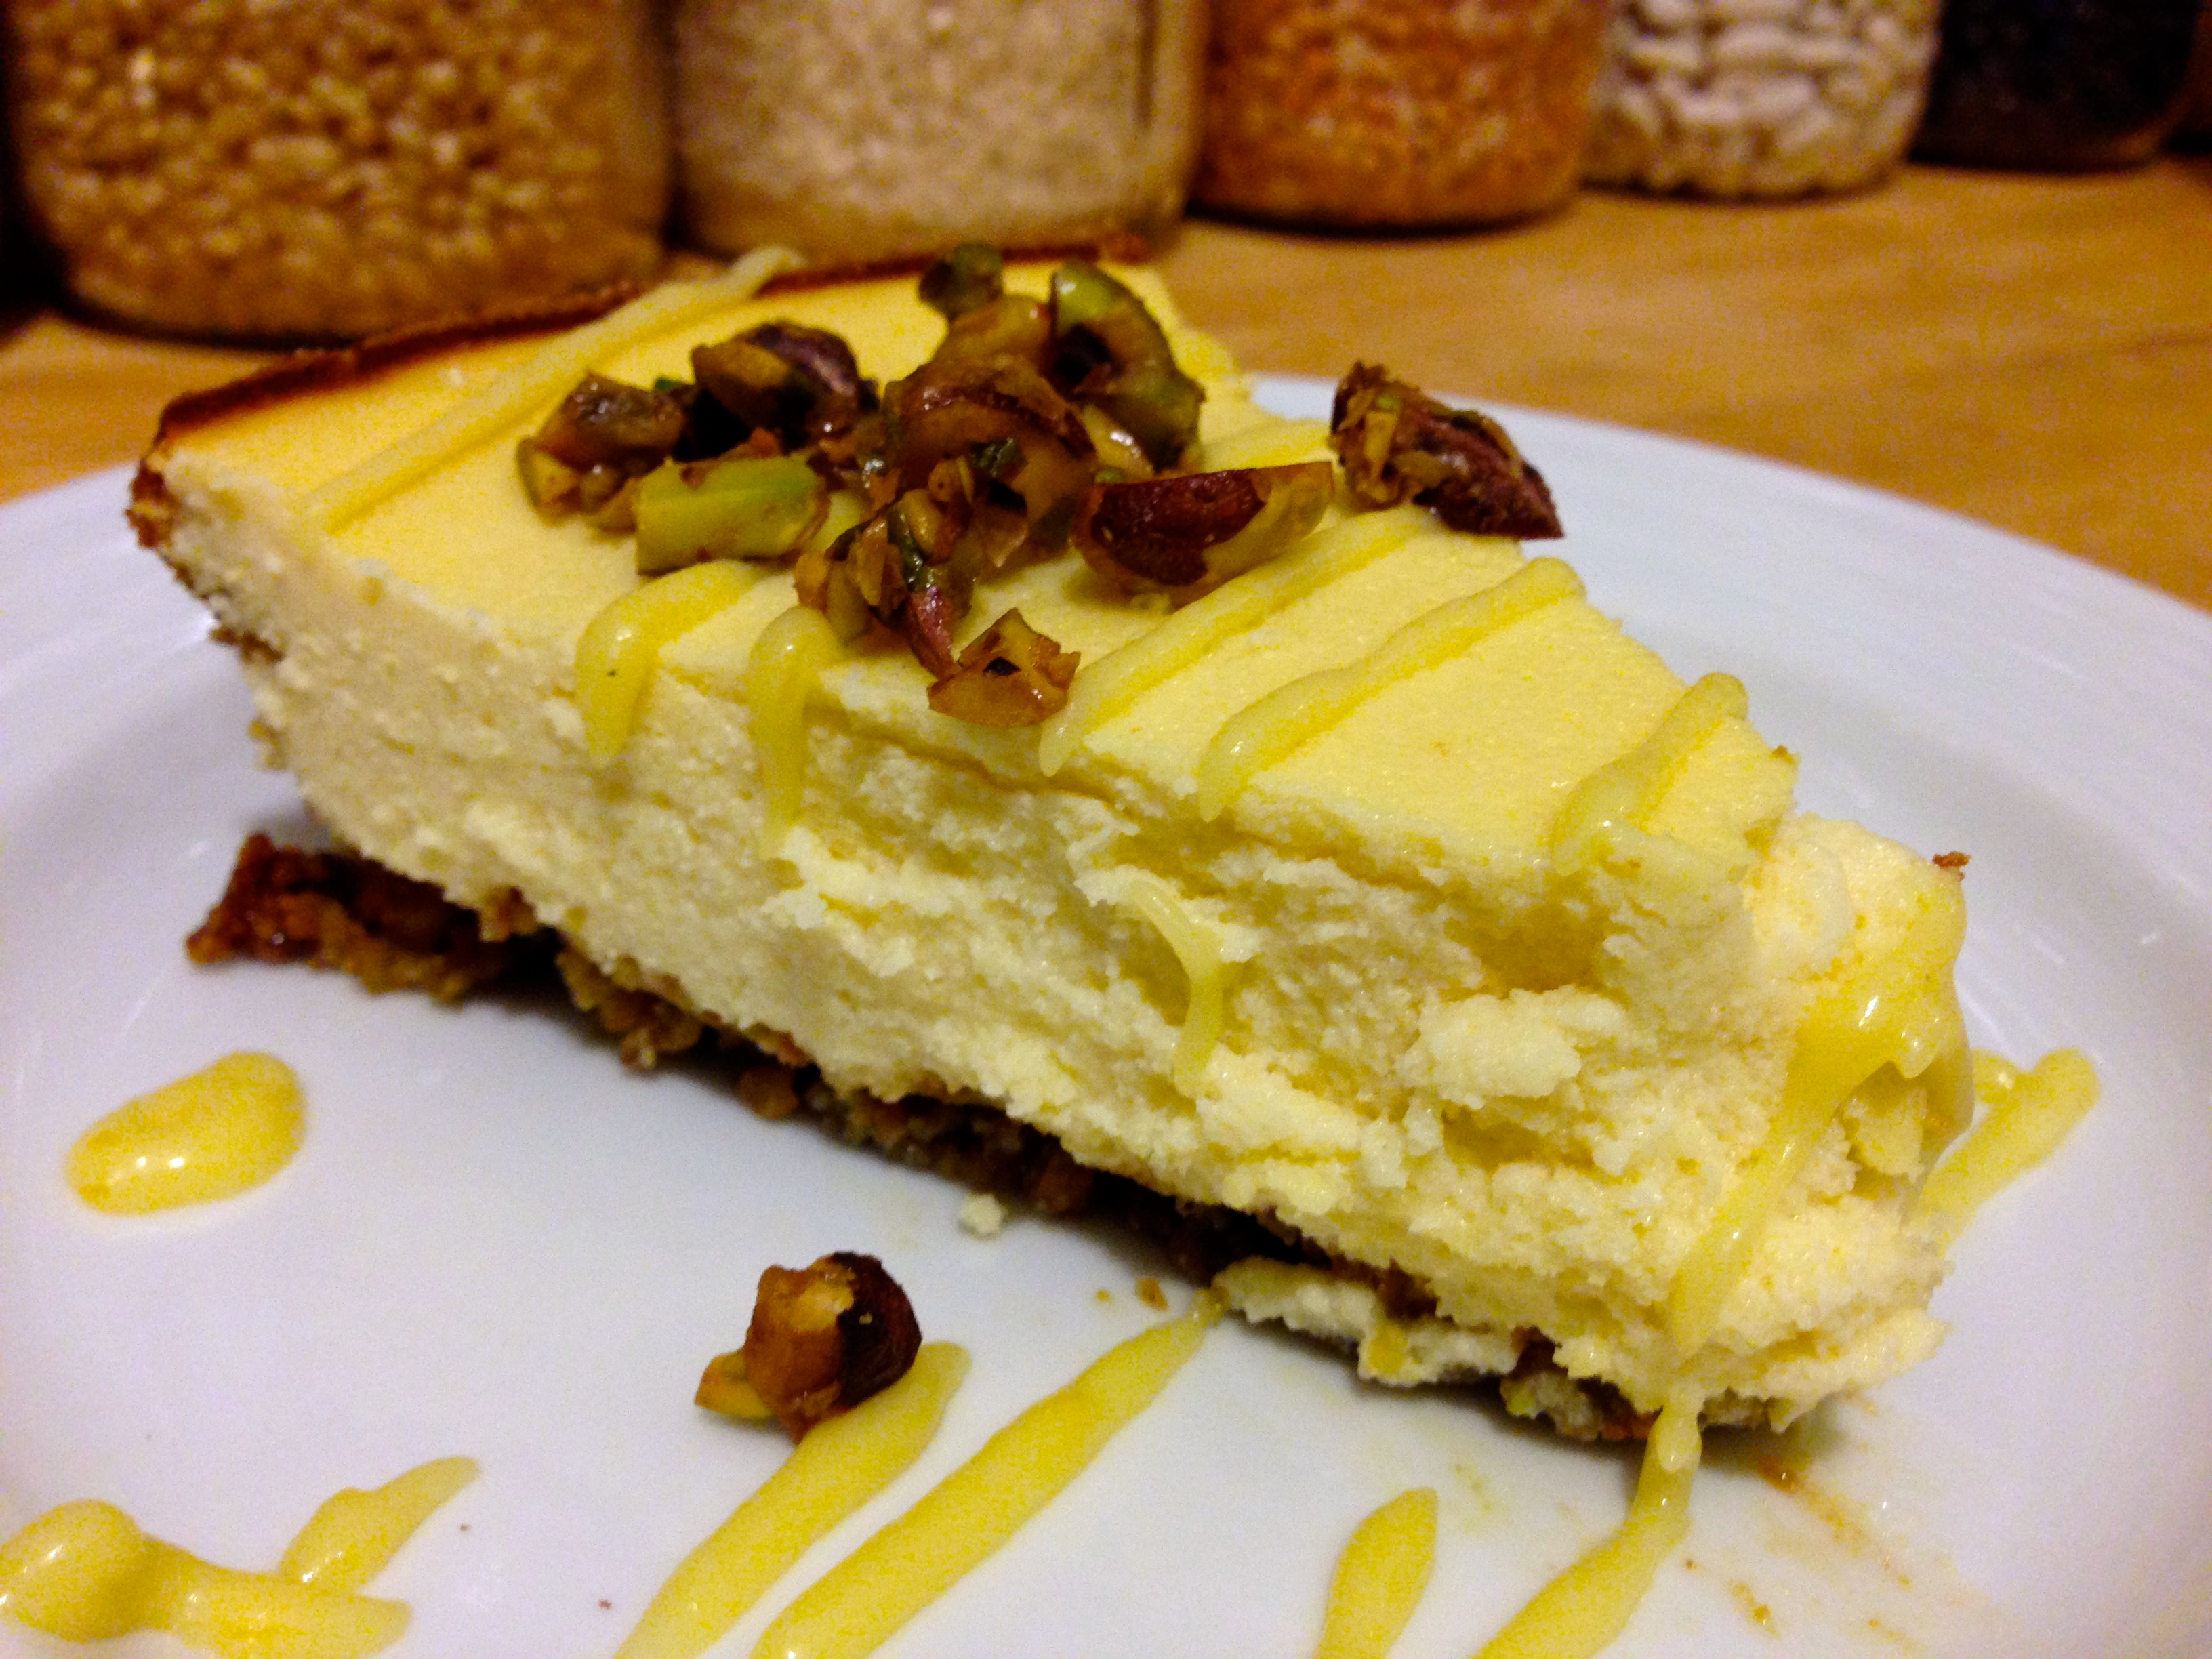 Goat Cheese Pistachio Cheesecake with Lemon Meyer Cream